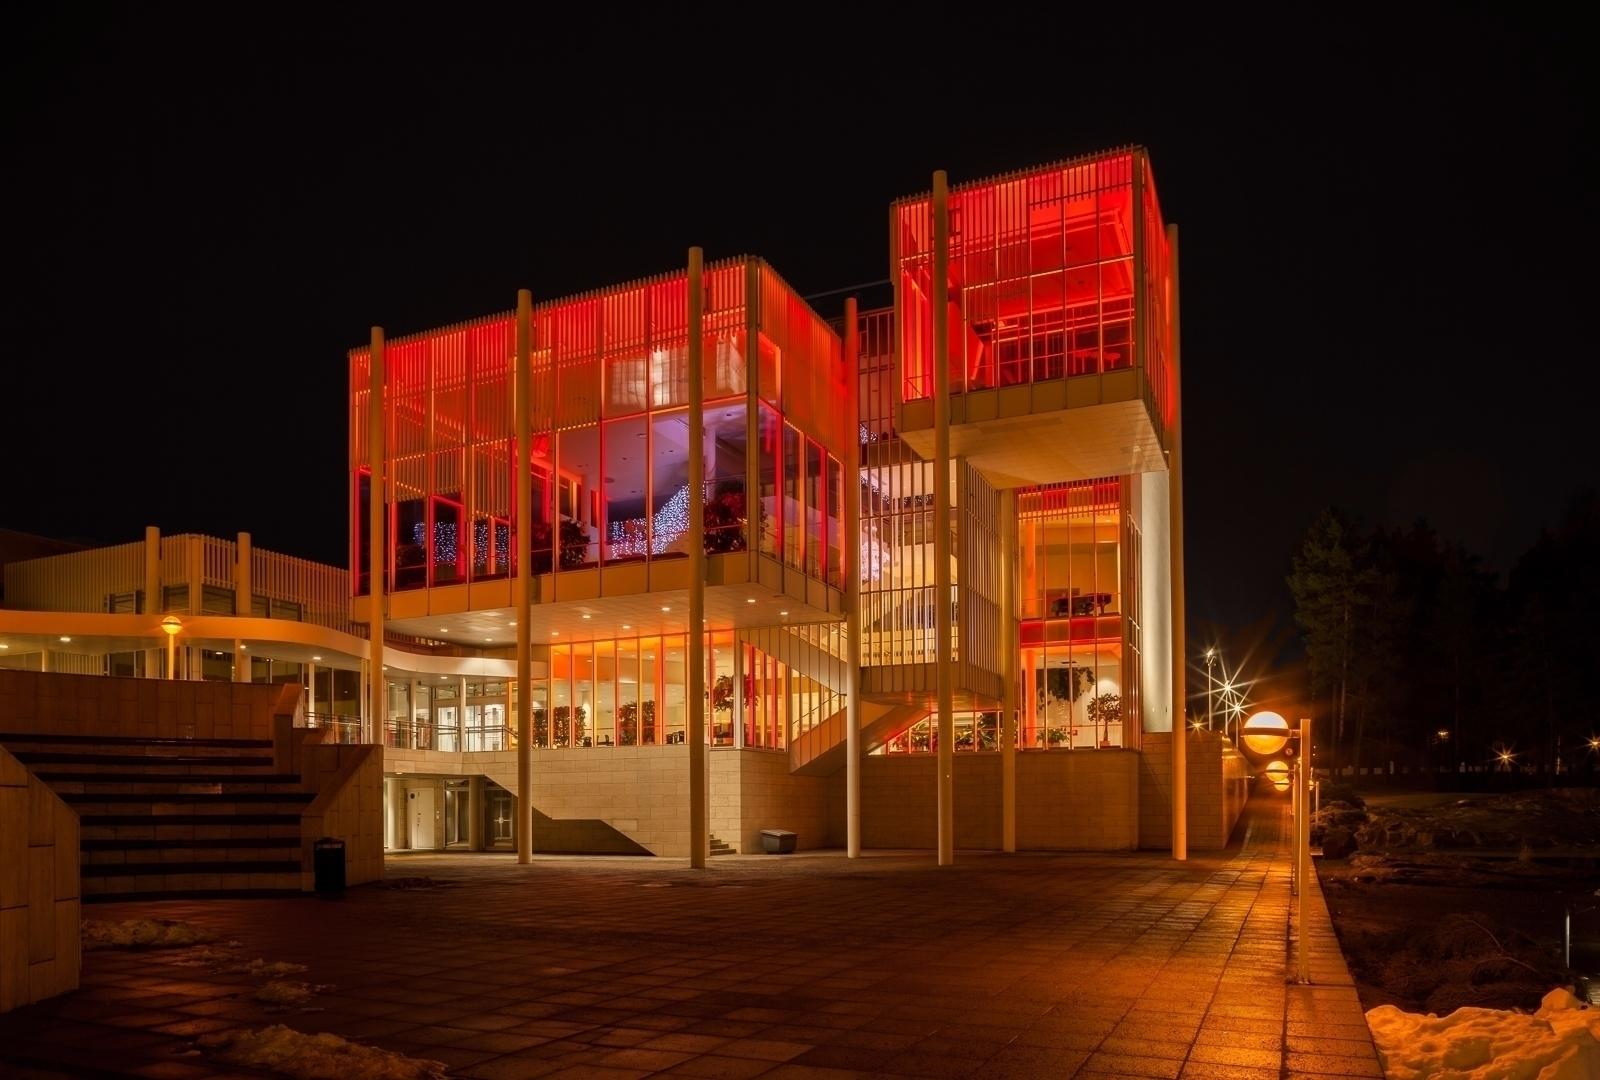 Culture Center pink - photography - anttitassberg | ello